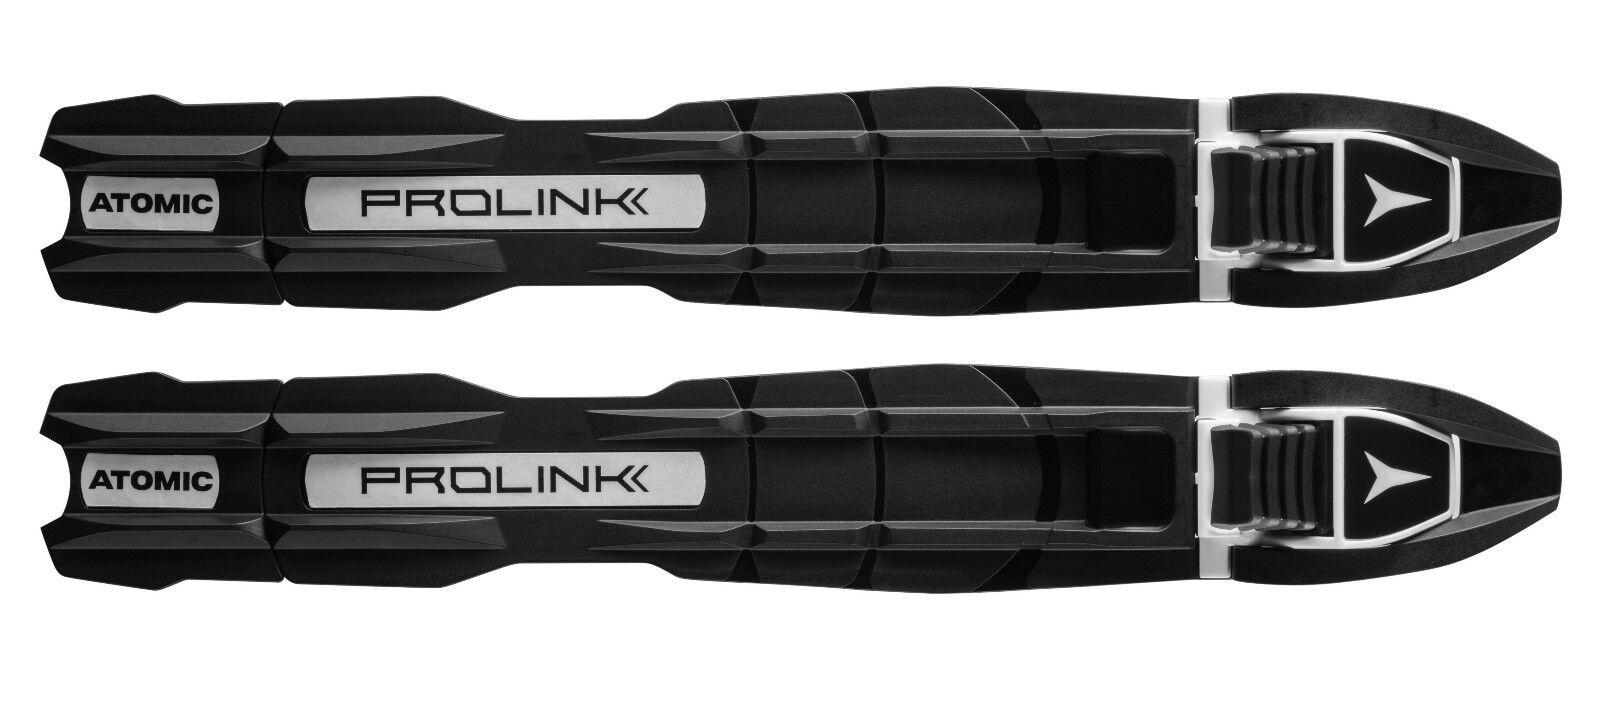 Atomic Langlauf Langlauf Atomic Ski 100cm mit montierter Prolink NNN Jr. Bindung 6f4d1b